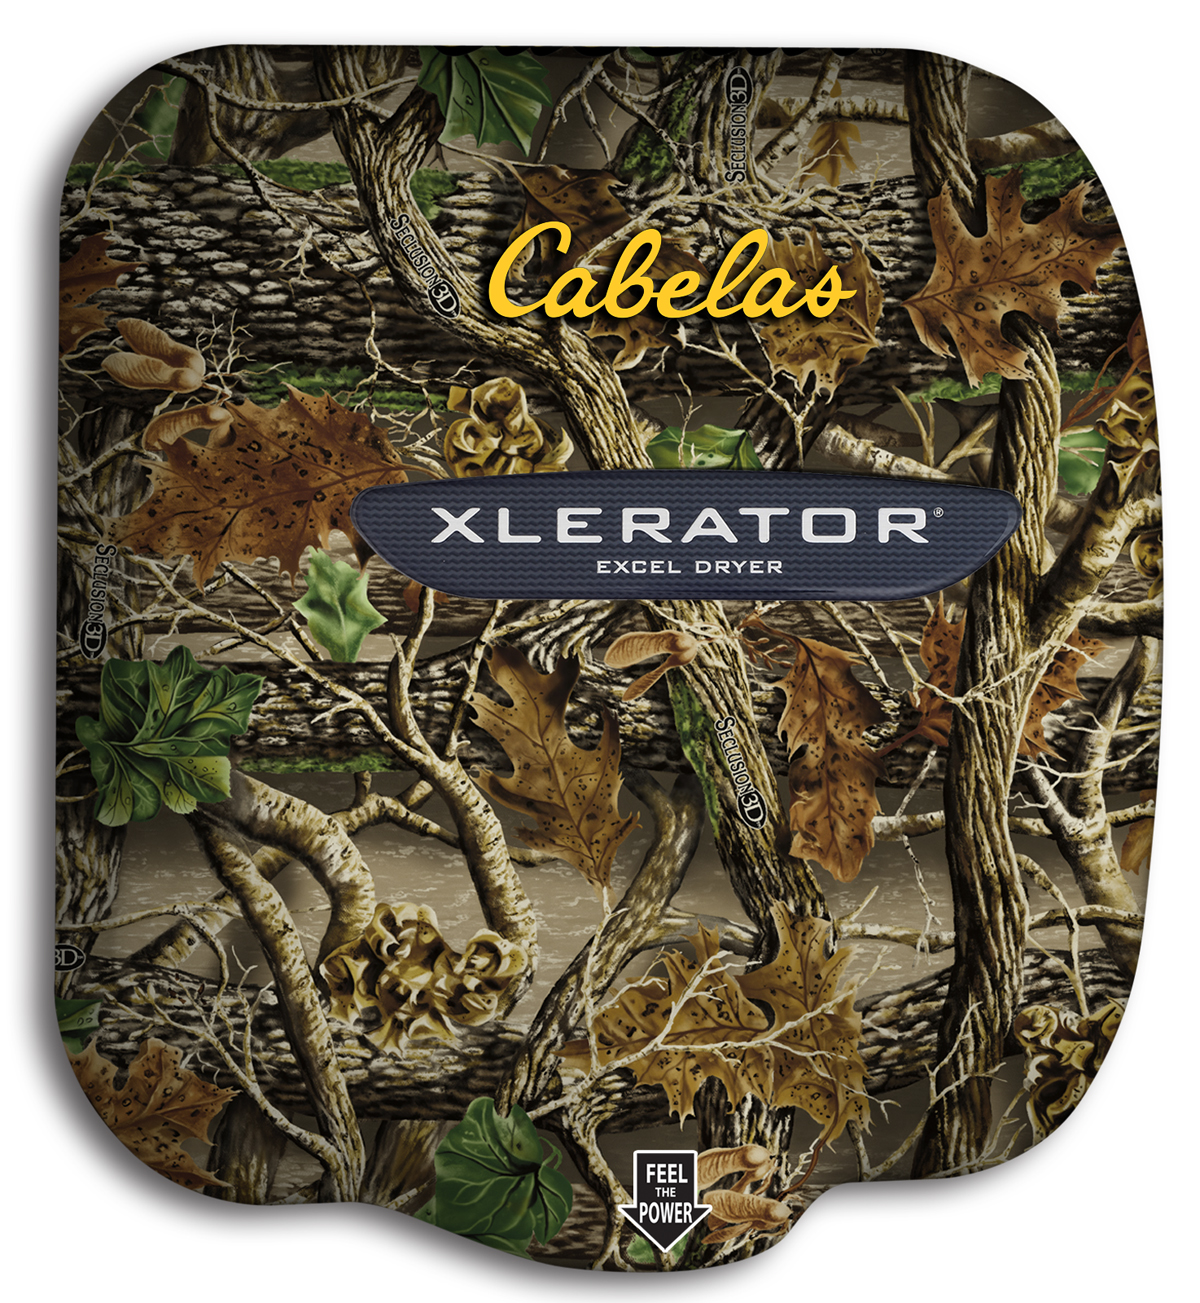 Xlerator Hand Dryer Custom Cover